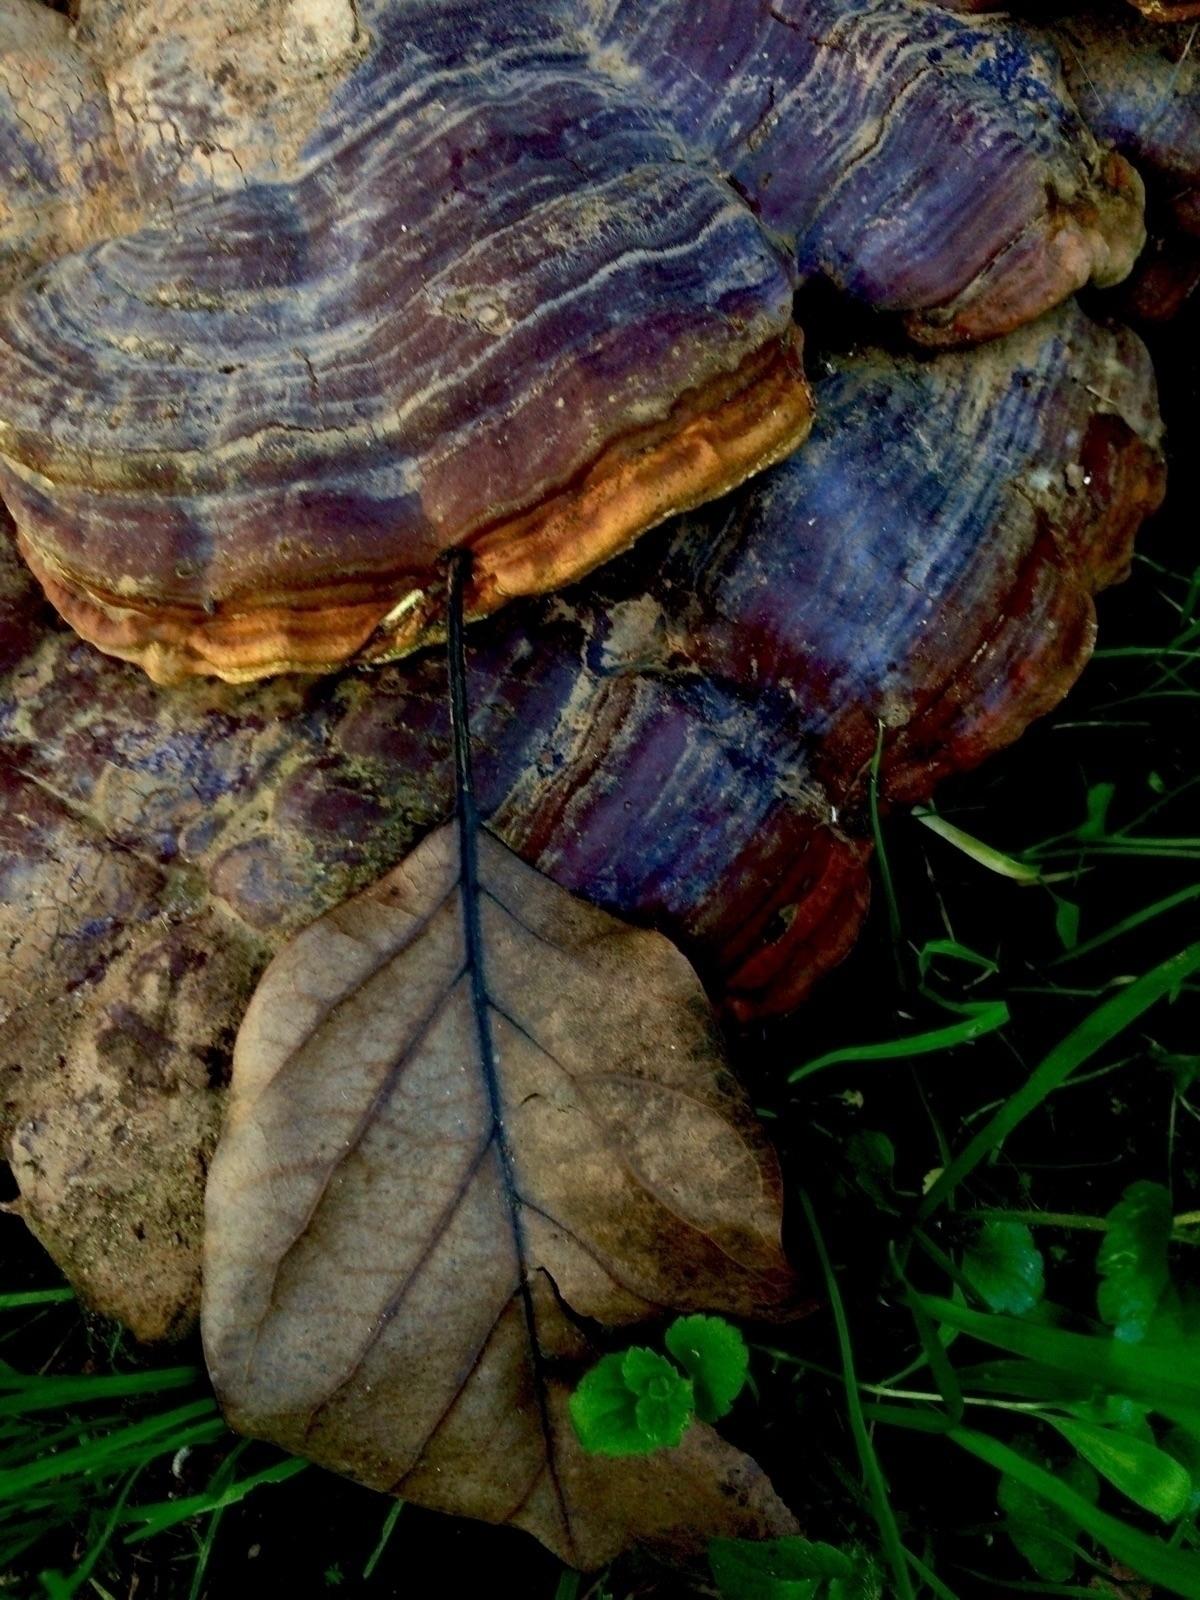 mushrooms, photography, nature - ivop | ello